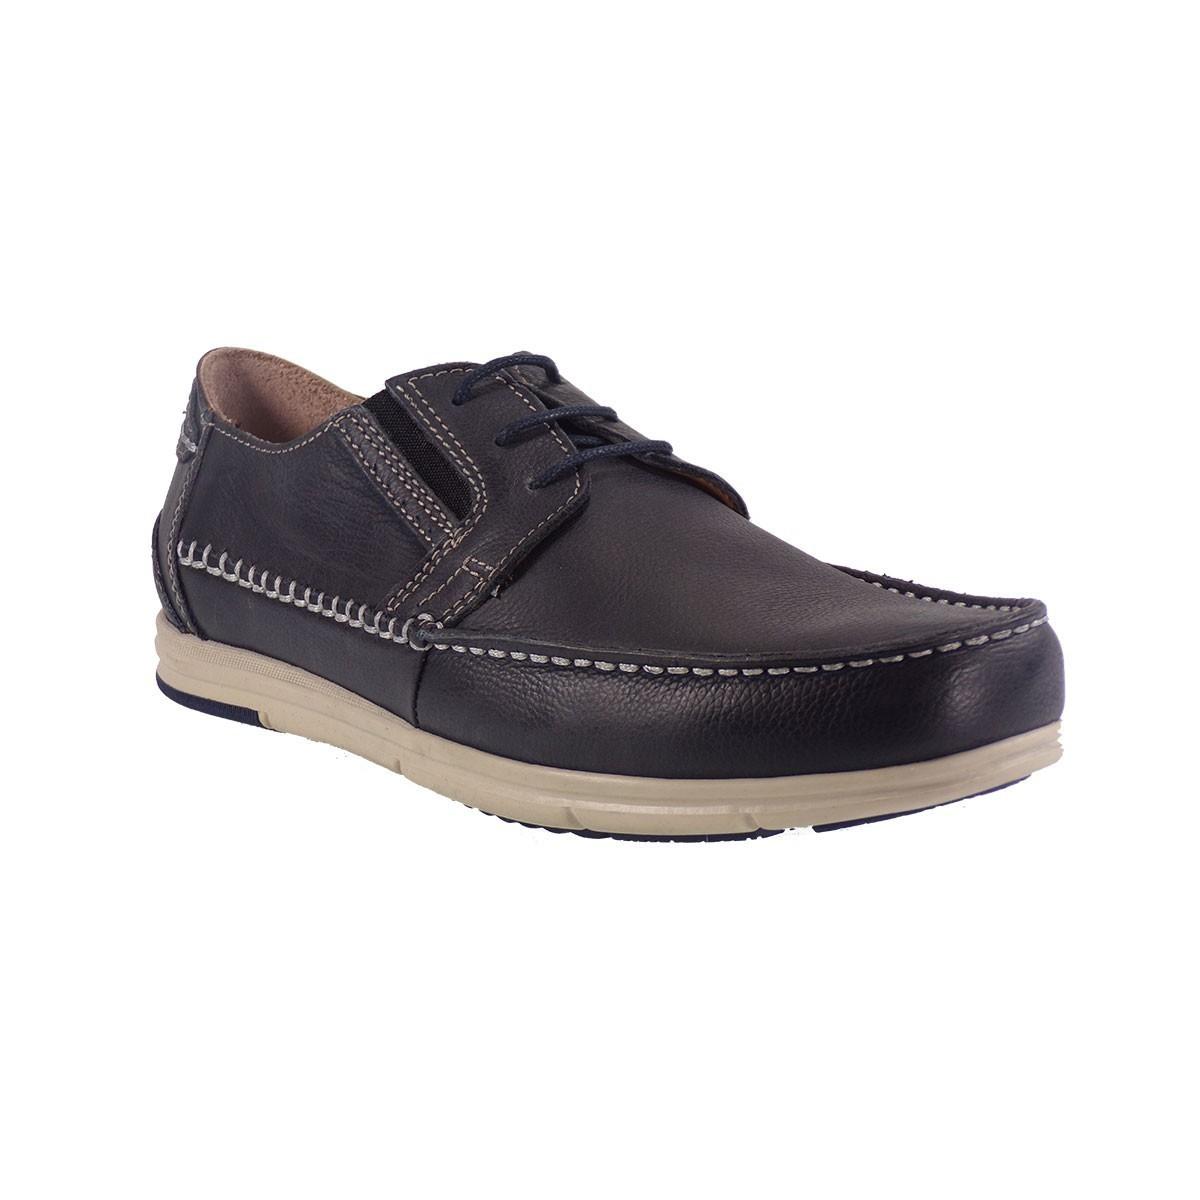 member shoes andrika papoytsia anatomika 9019 mple www.bagiotashoes.gr